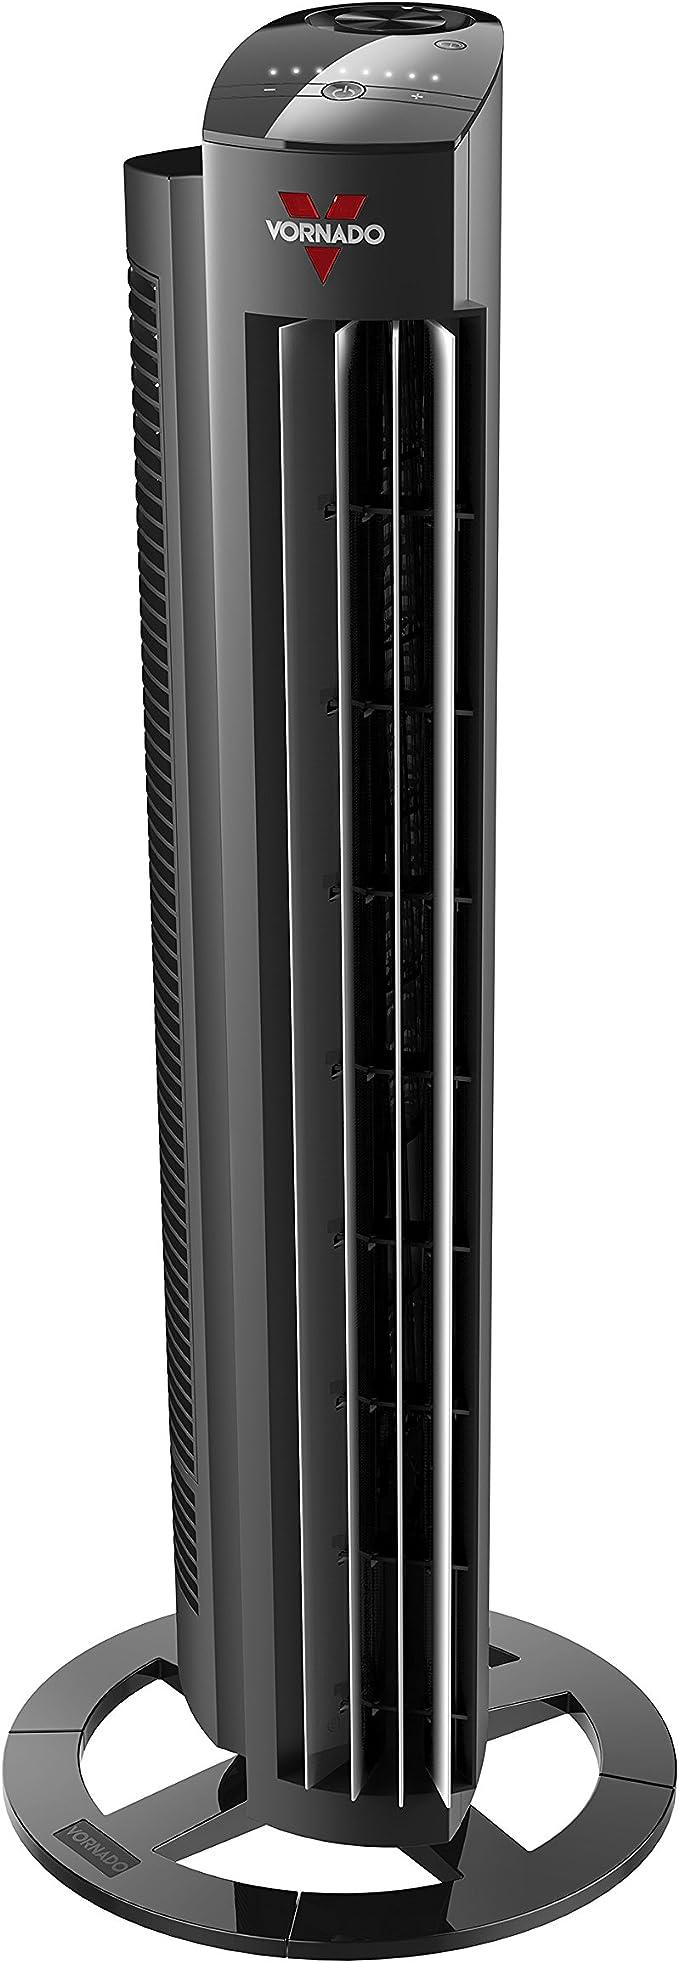 Noir Vornado Tour zirkulator Ventilateur AC Tower 701491